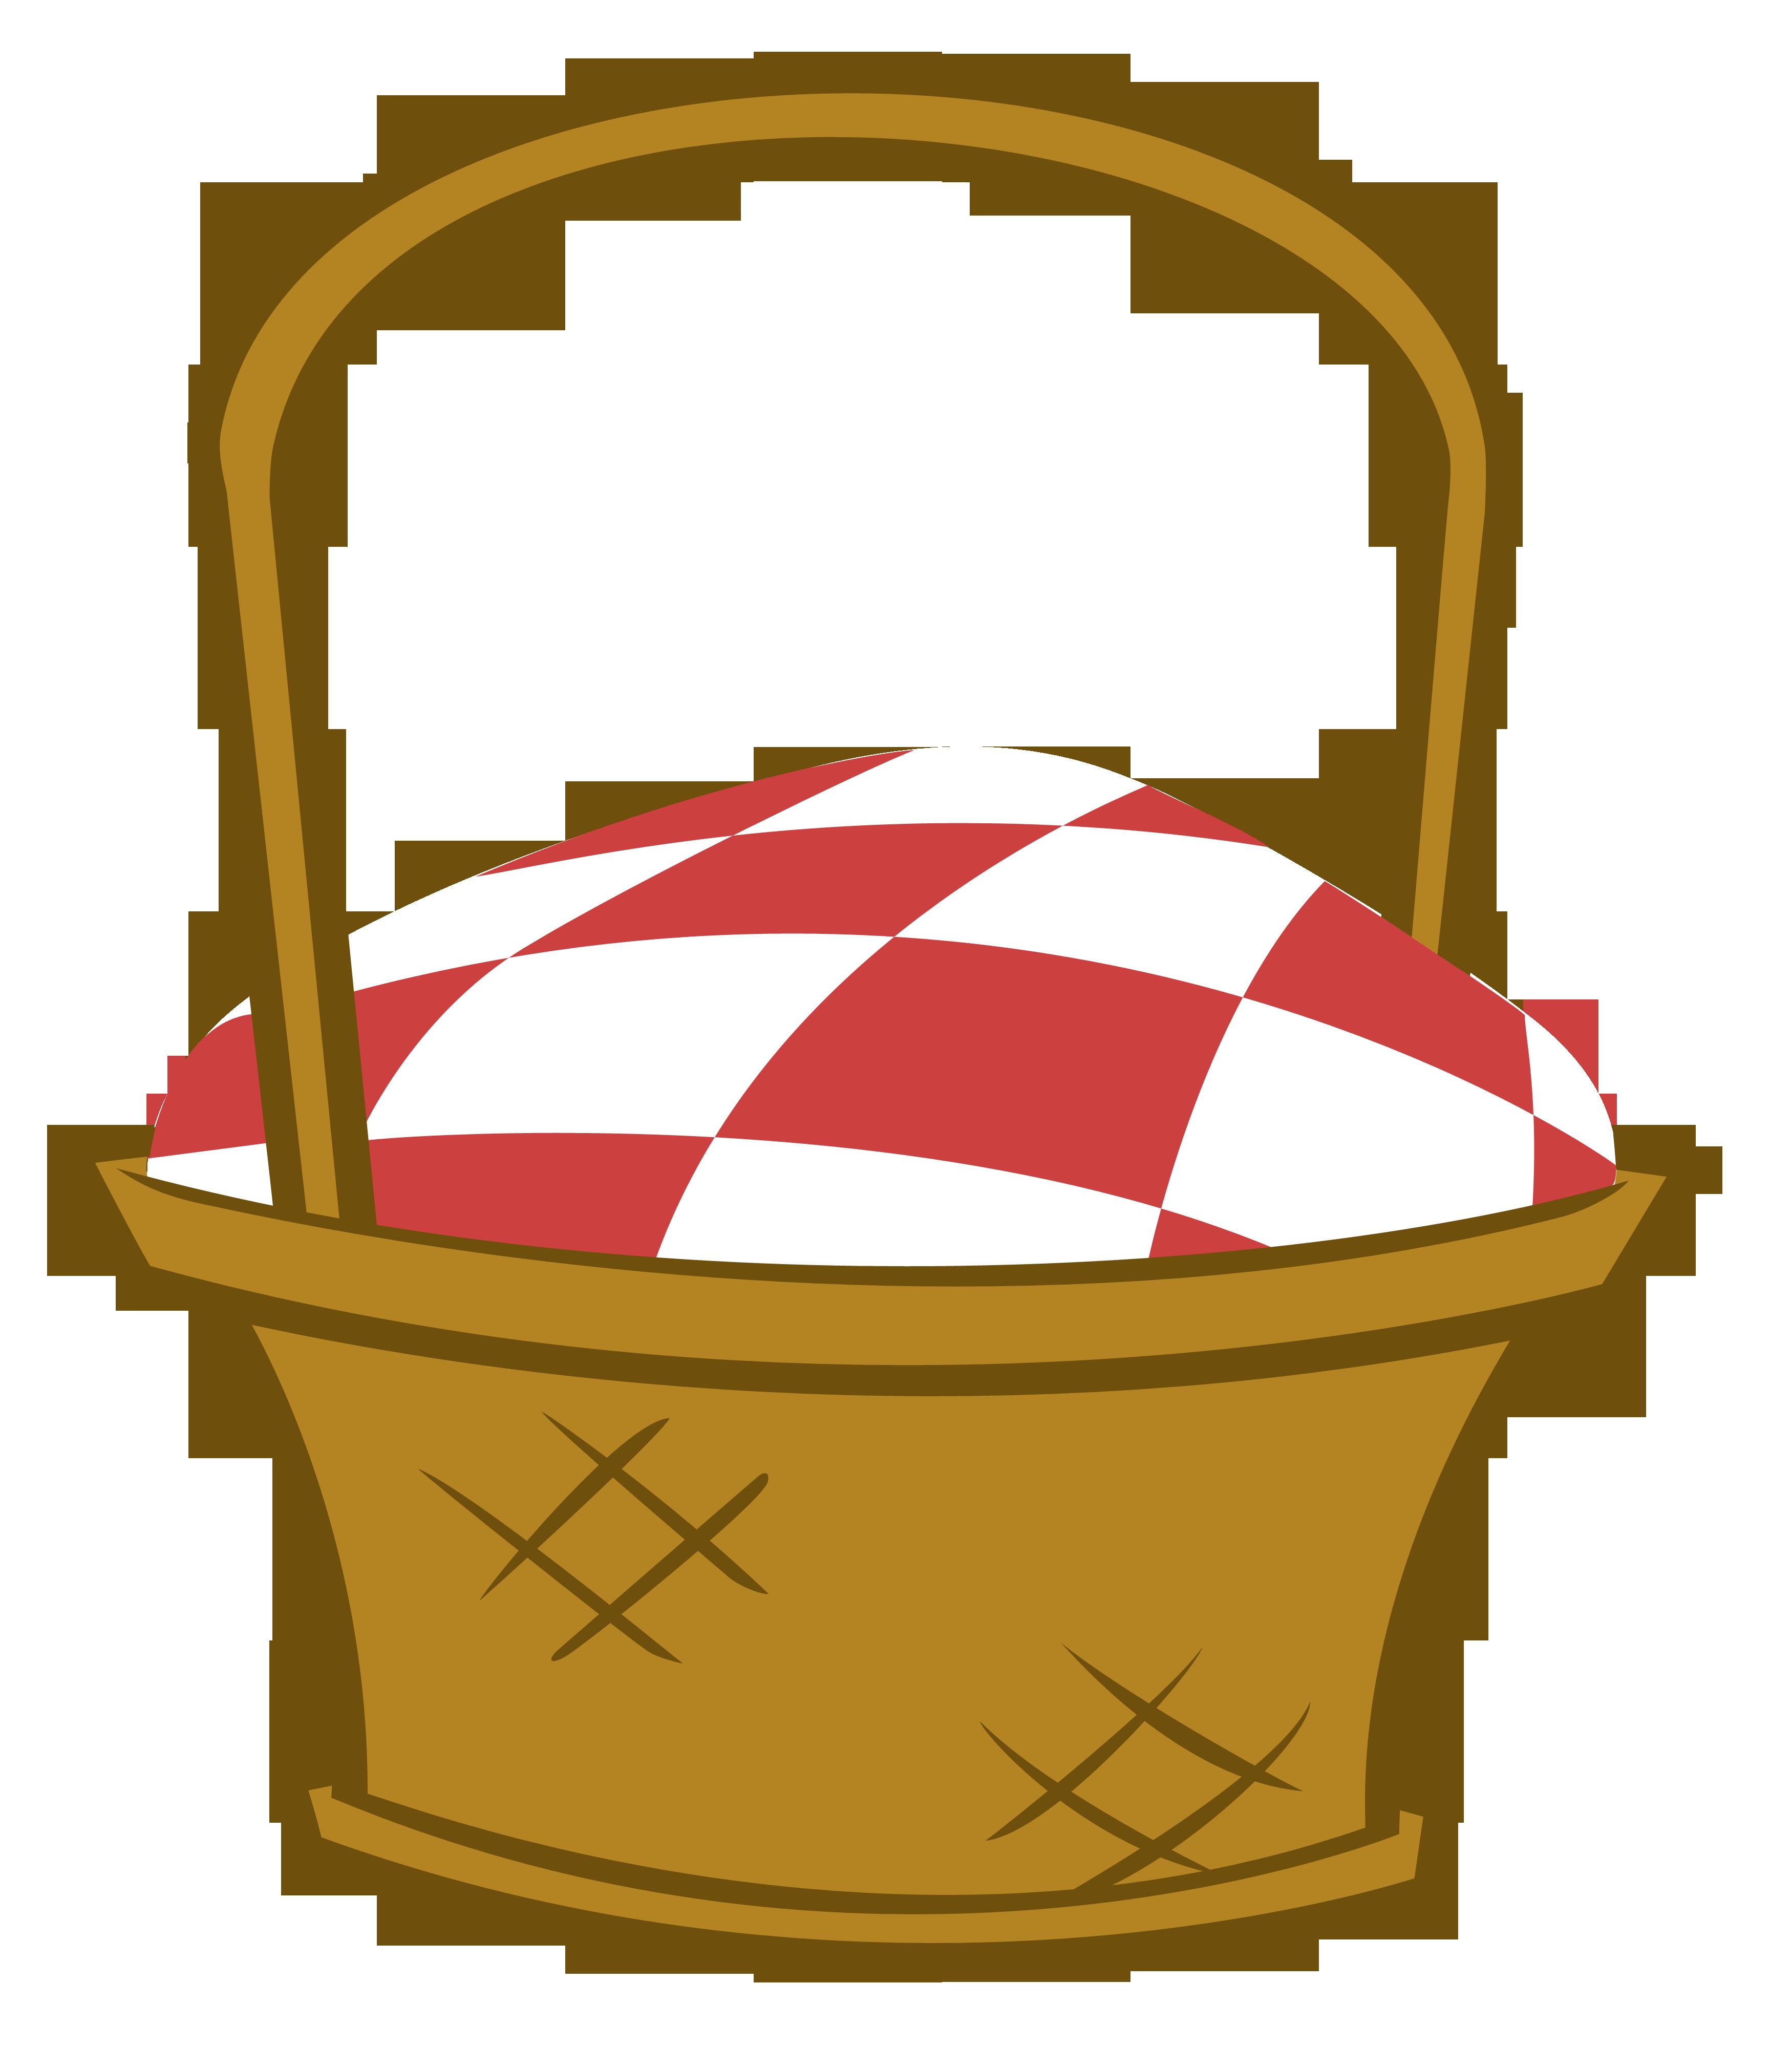 Clip Art Picnic Basket Clipart picnic basket clipart kid black and white panda free clipart